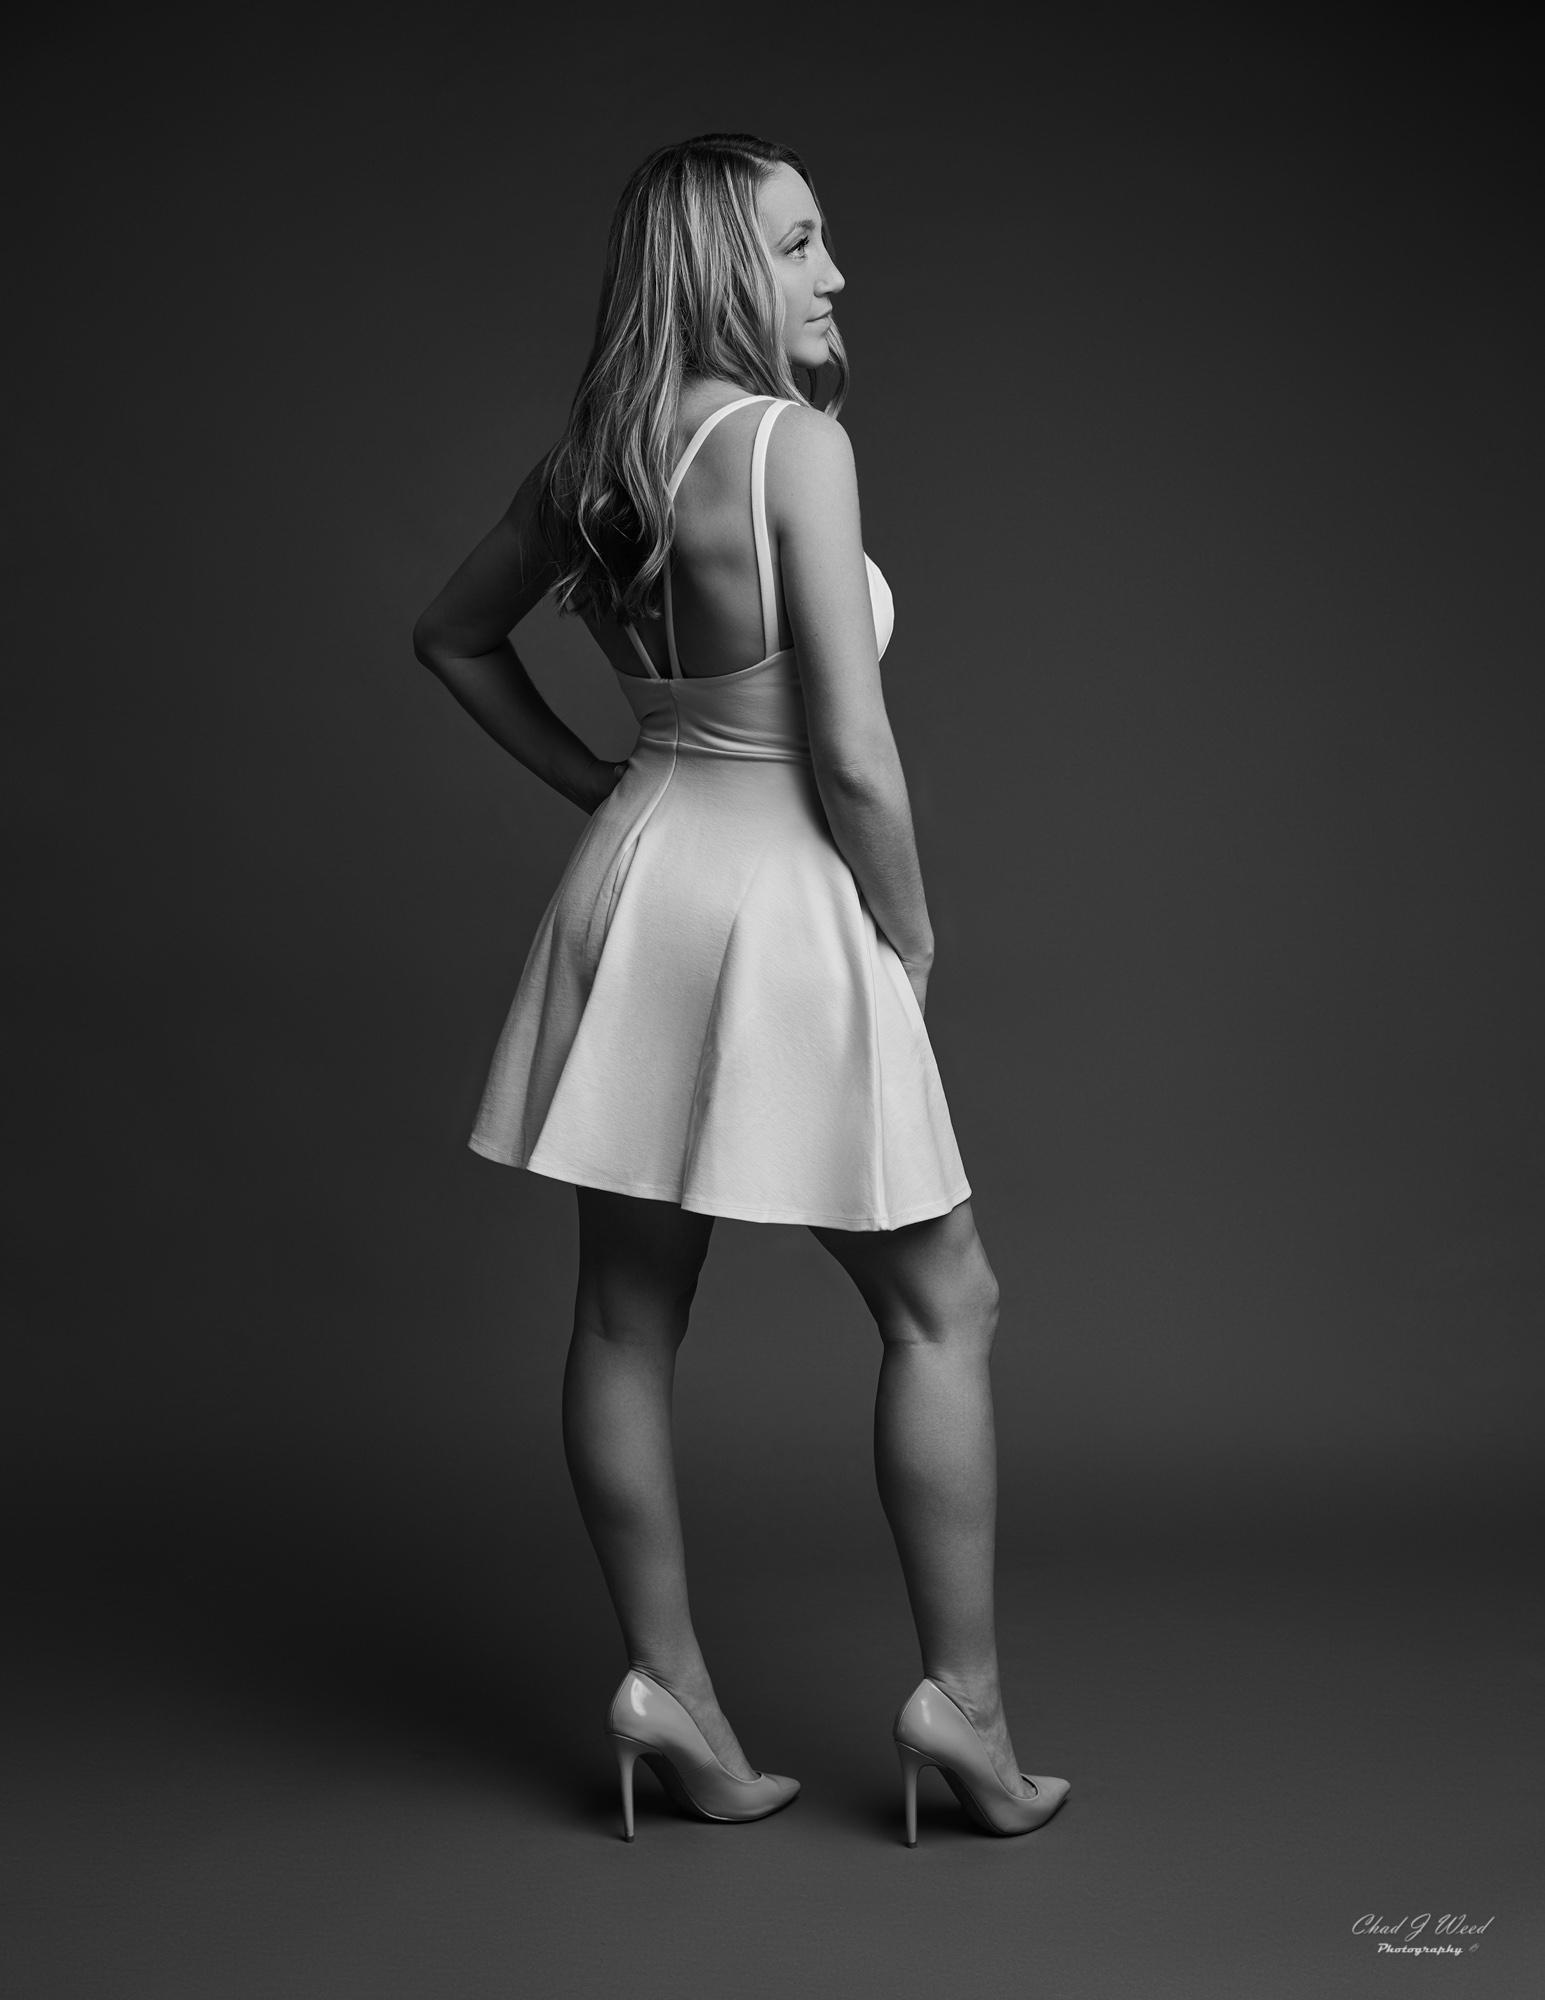 Kristen Leg Model by Mesa Arizona Portrait Photographer Chad Weed